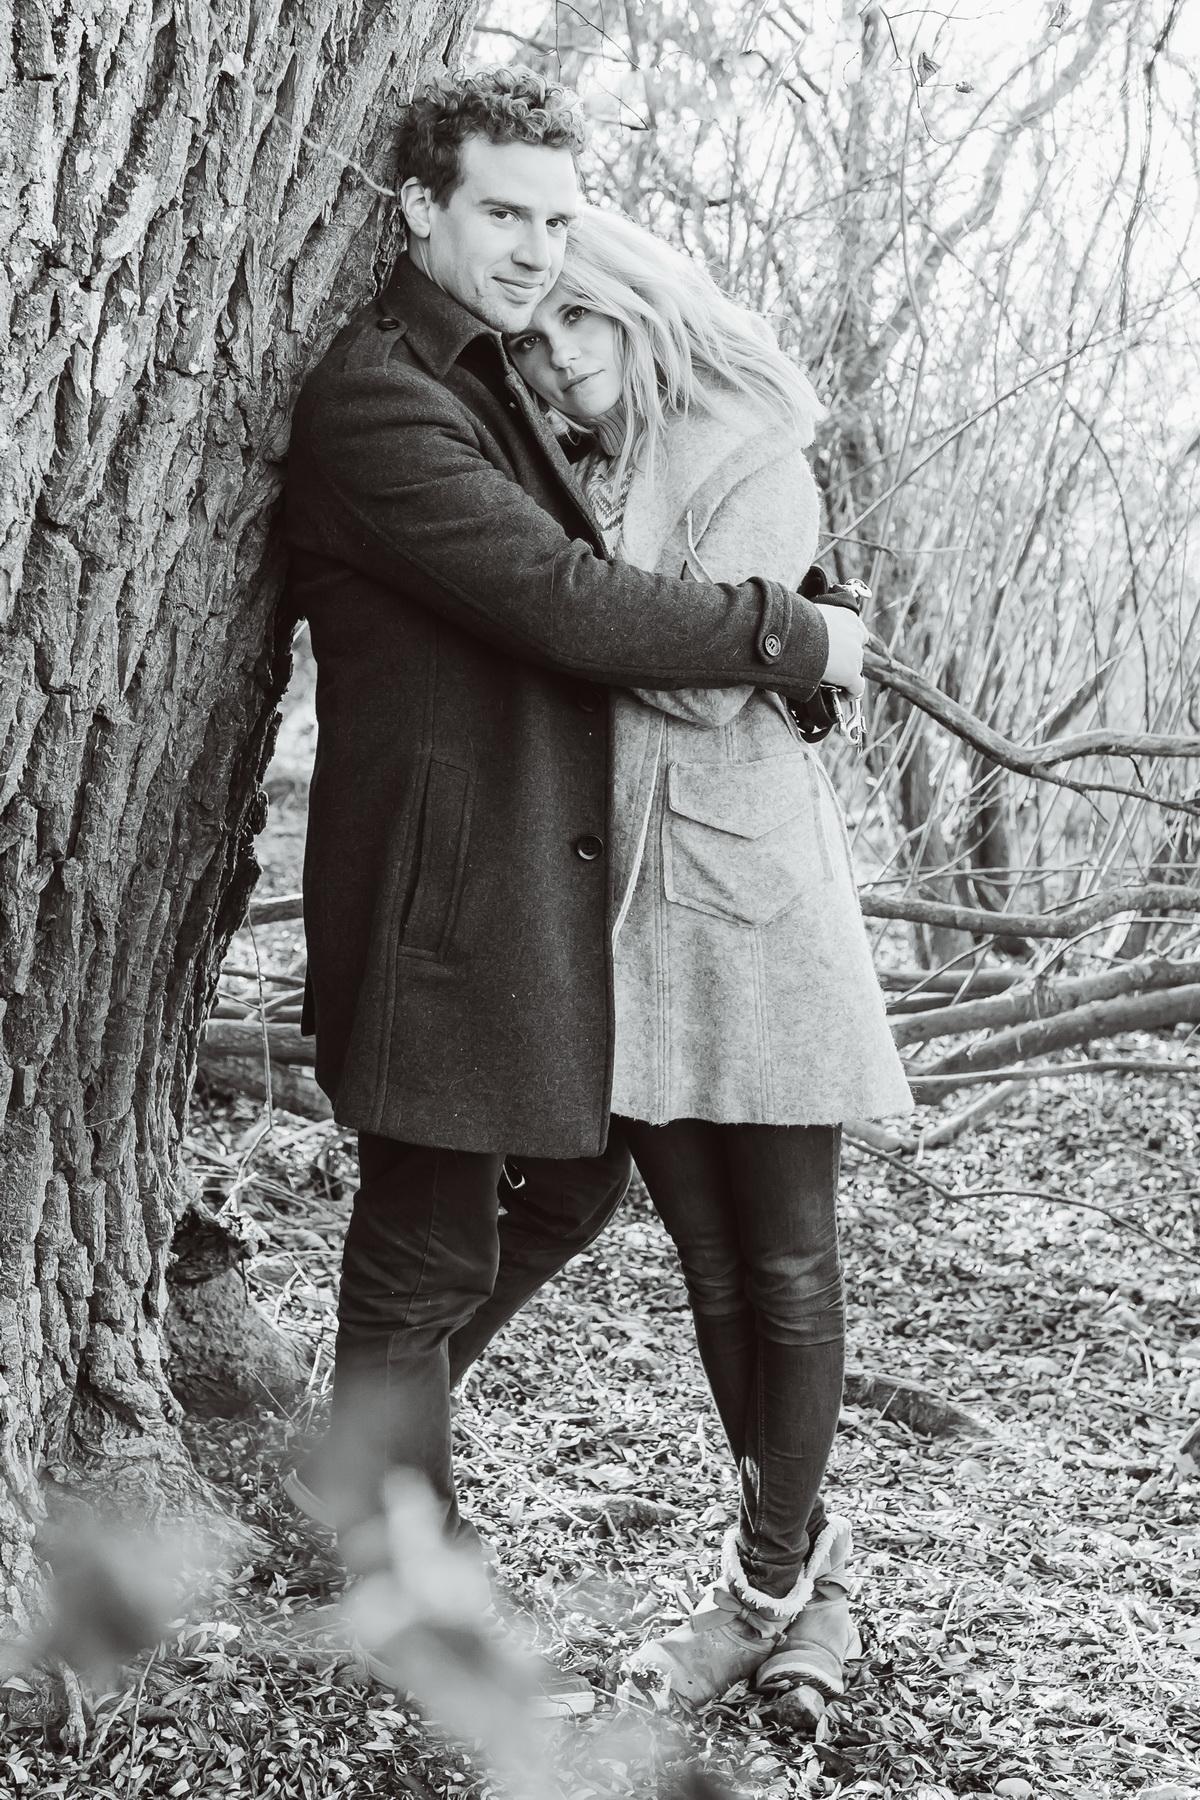 Loveshoot - Julia und Stefan - Claudia Sittig Photography - Lake Ammersee DX0B2537-2-3